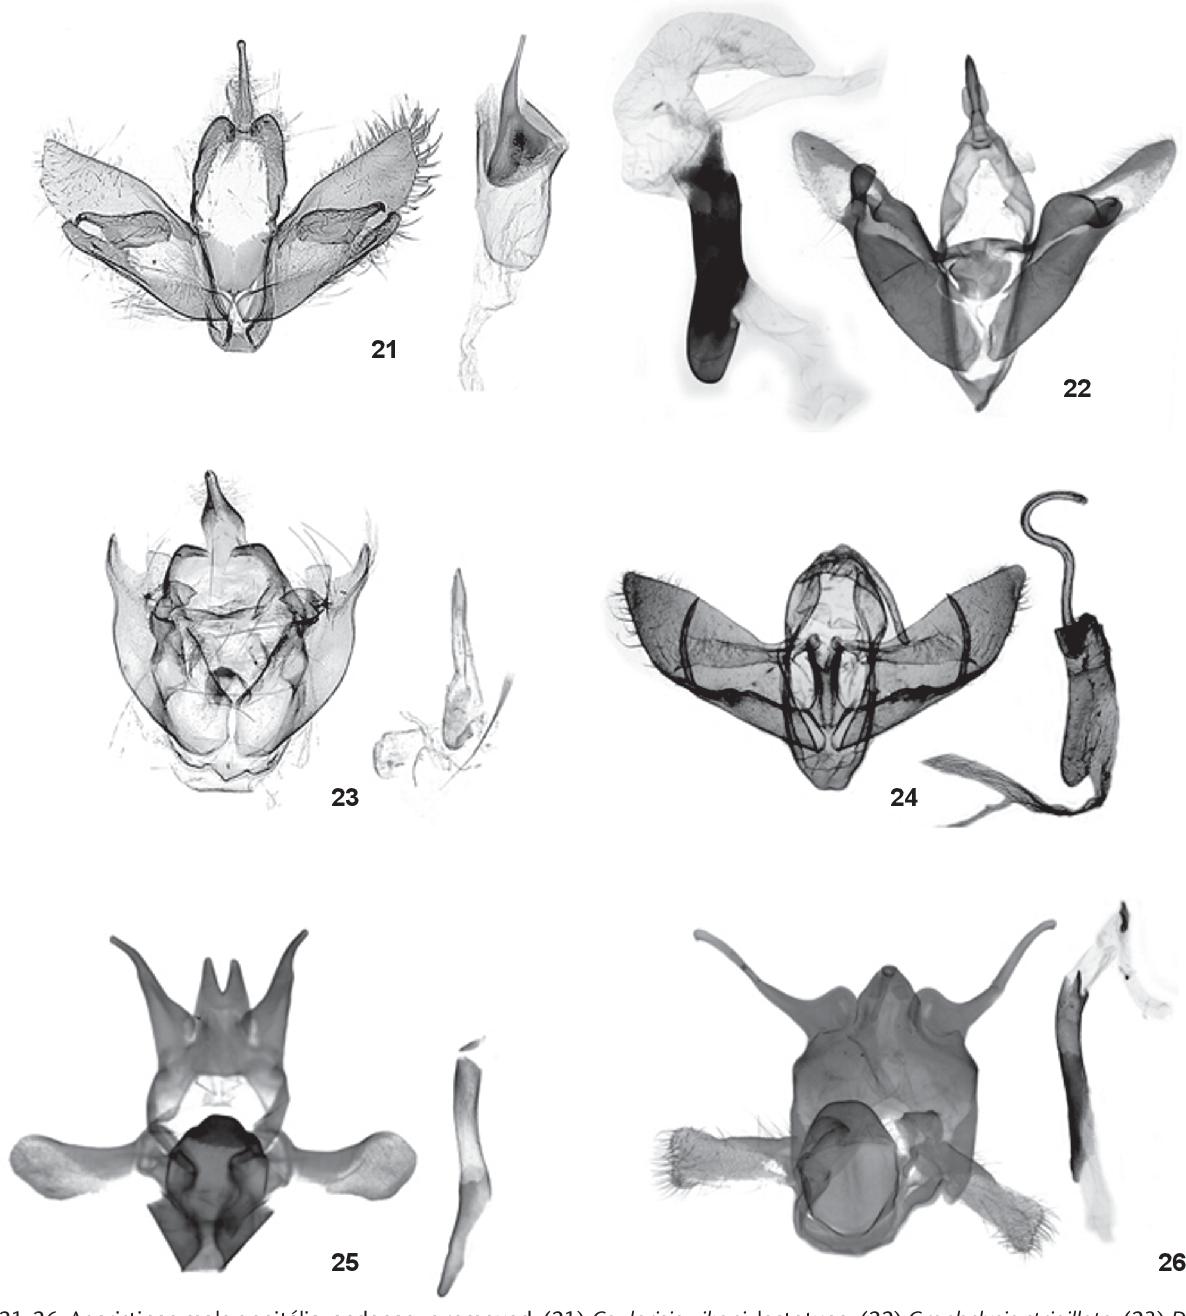 figure 21-26